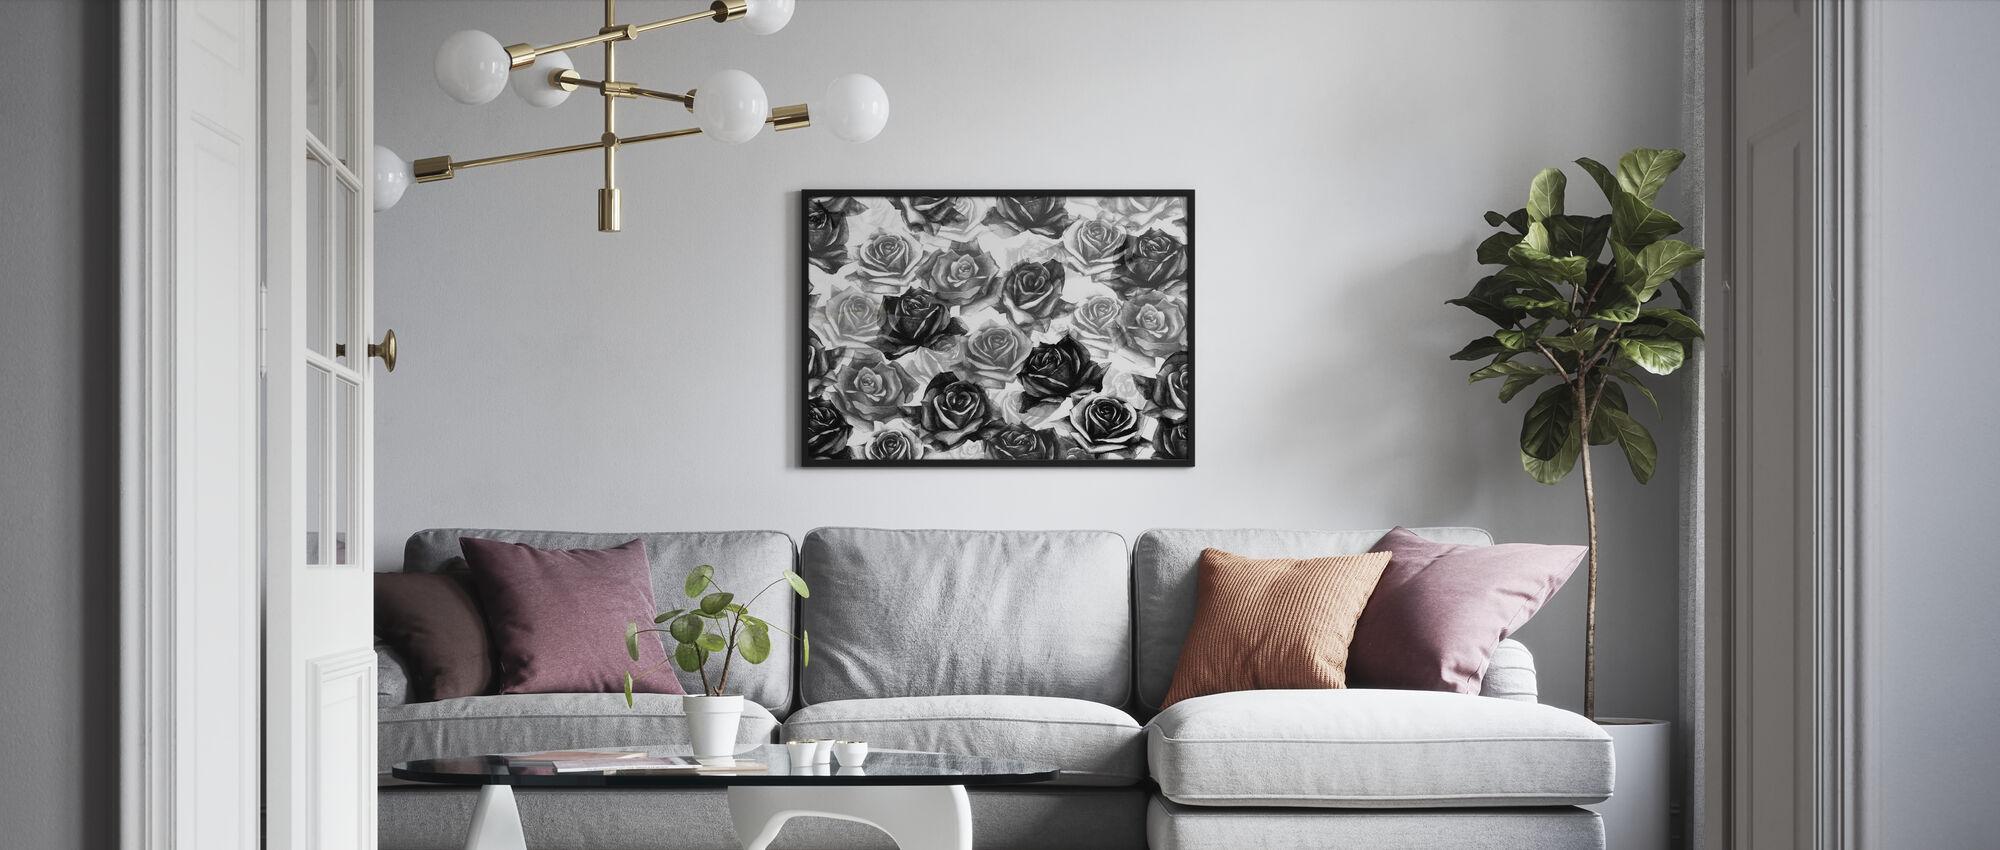 Mina svarta rosor - Poster - Vardagsrum